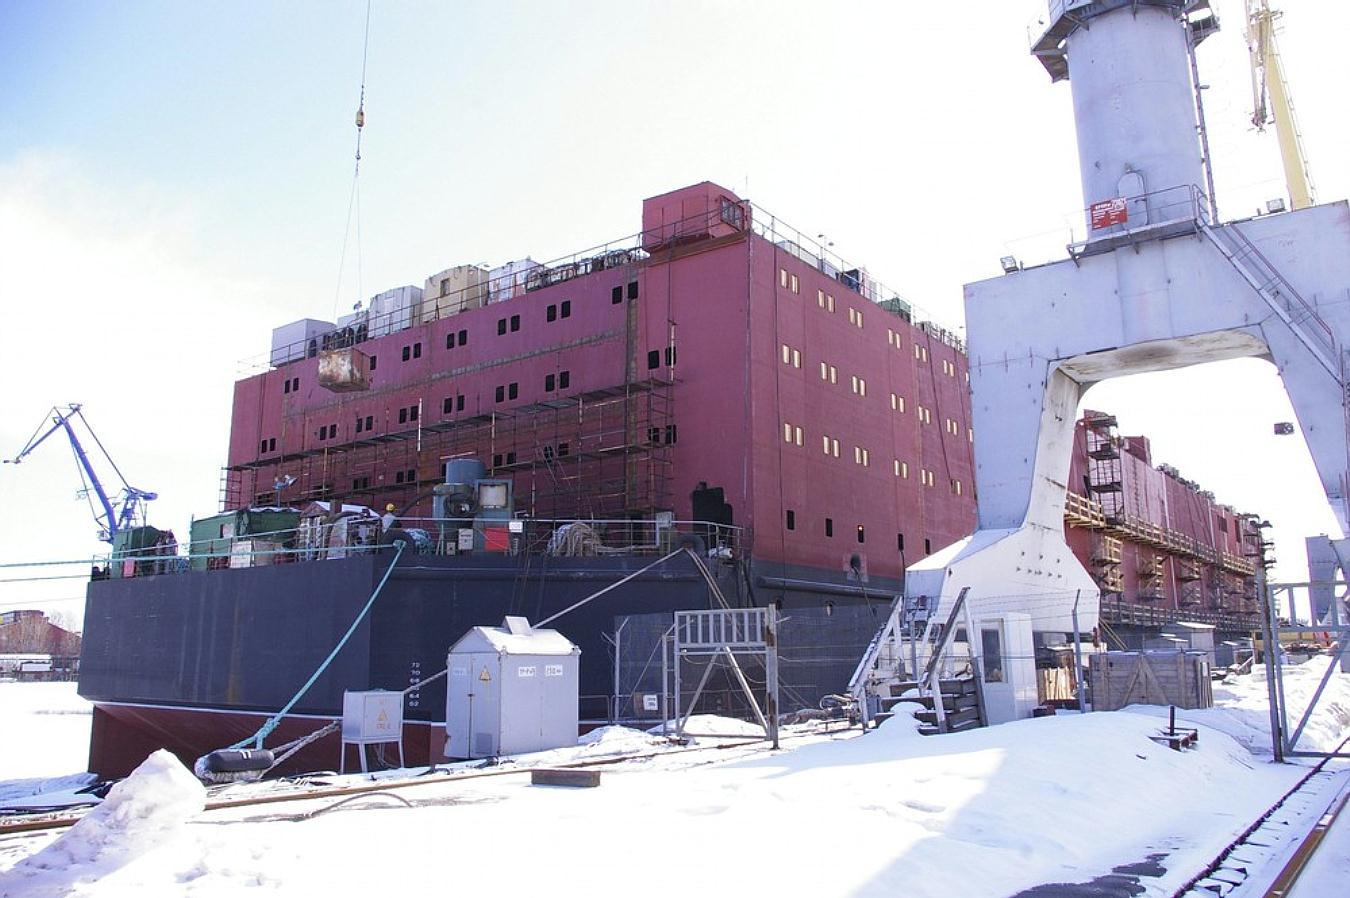 fukushima daiichi nuclear power plant photos   image